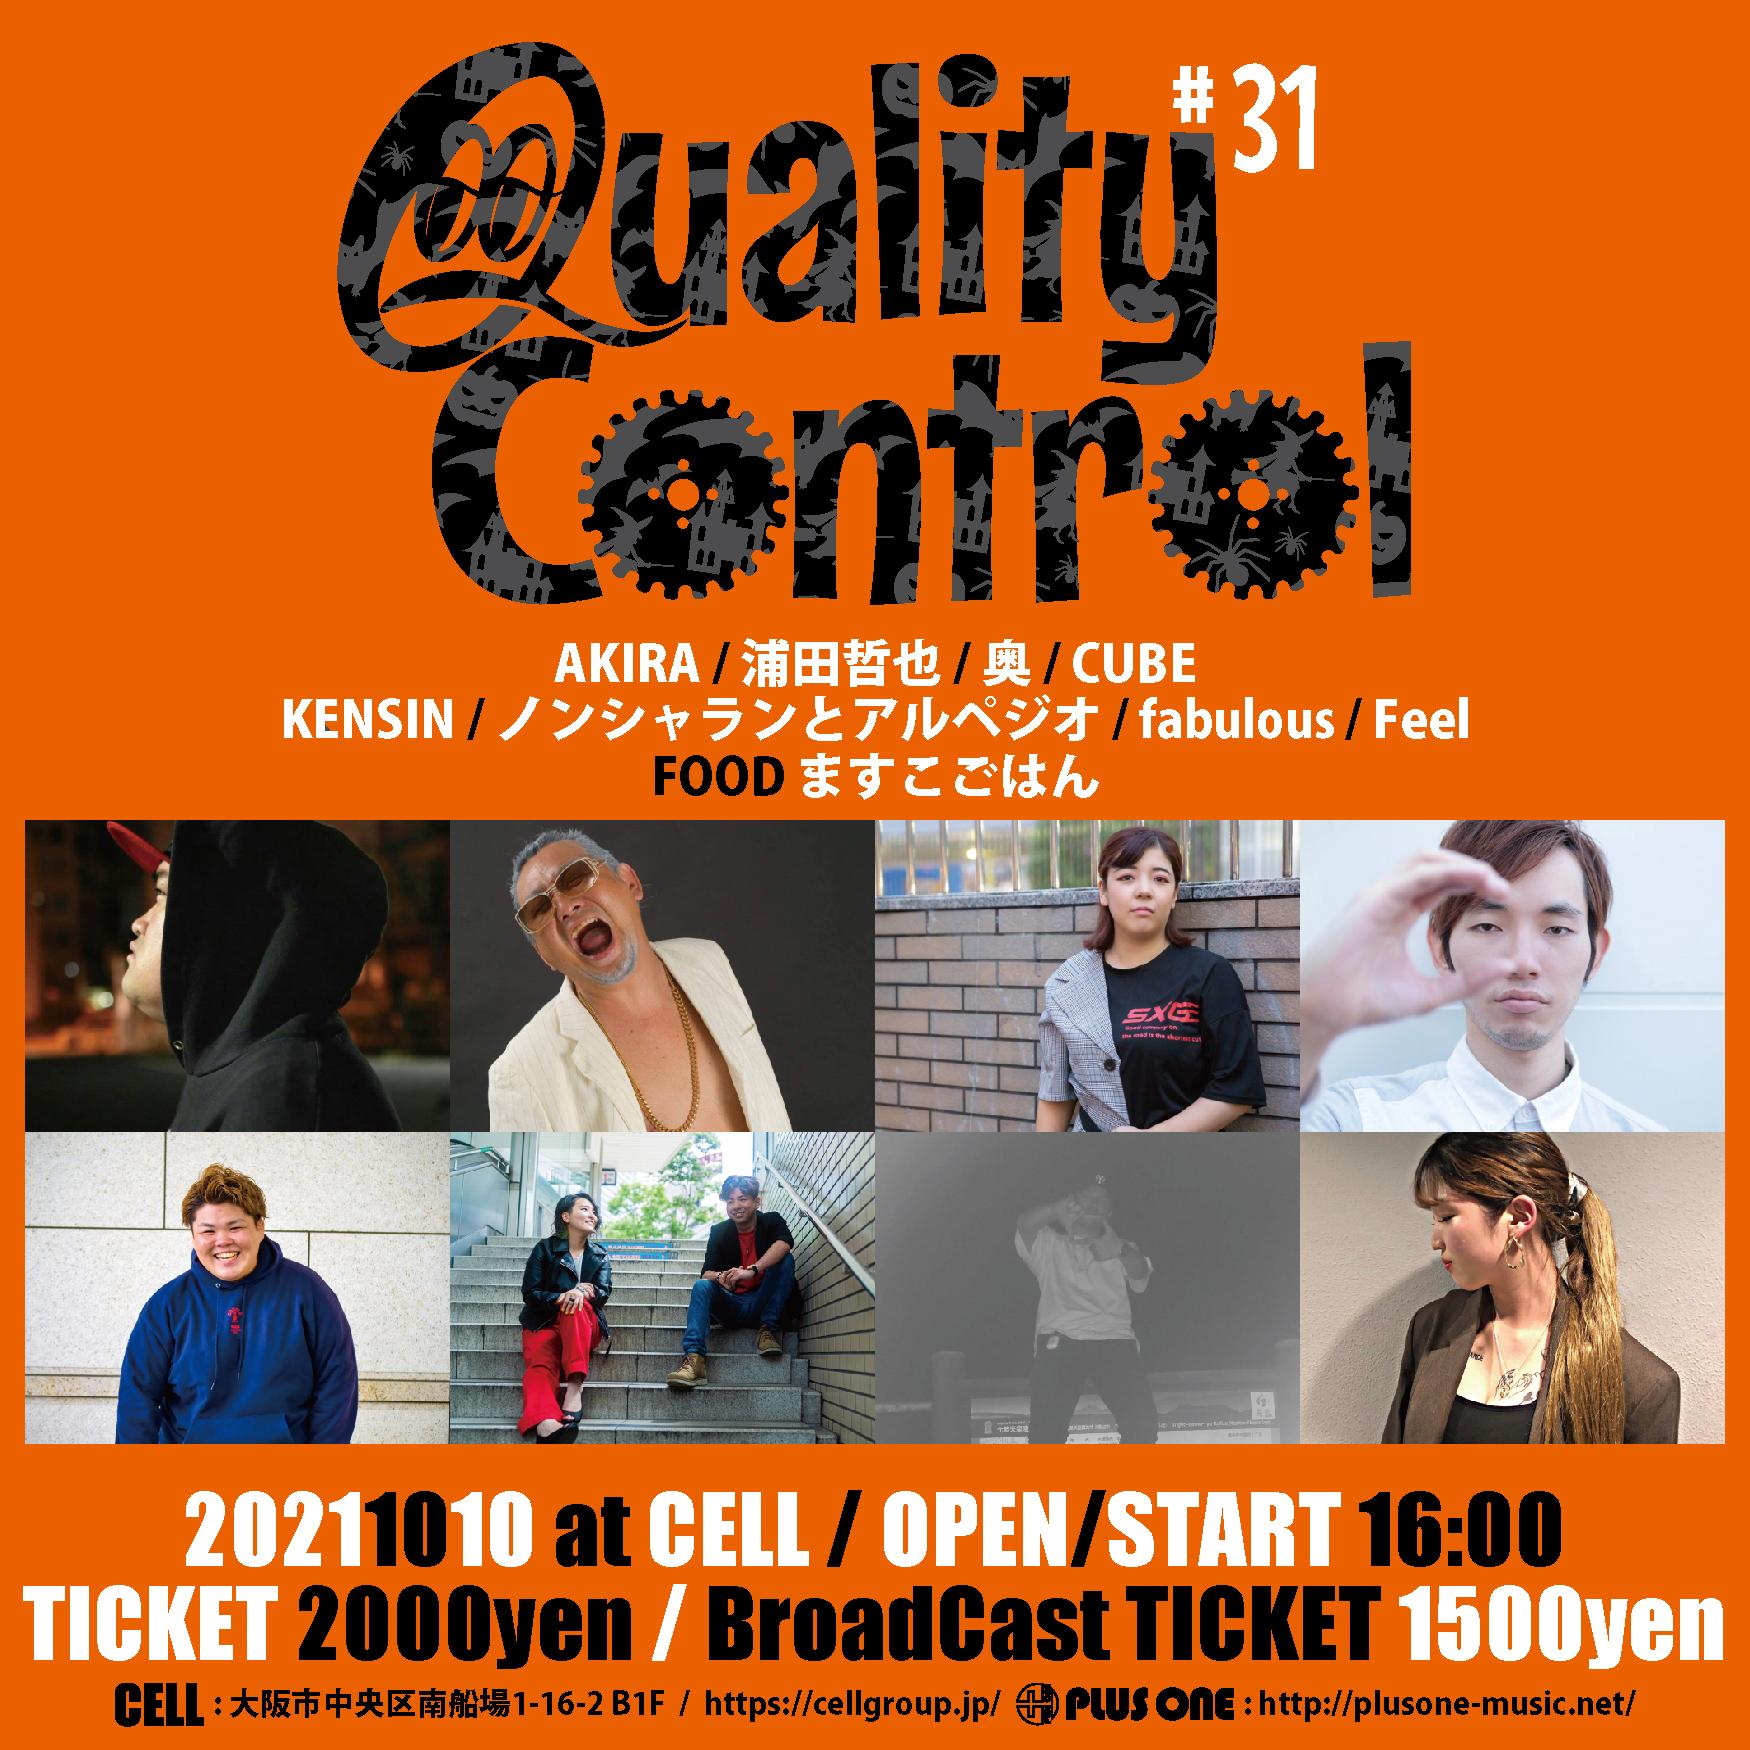 Quality Control #31